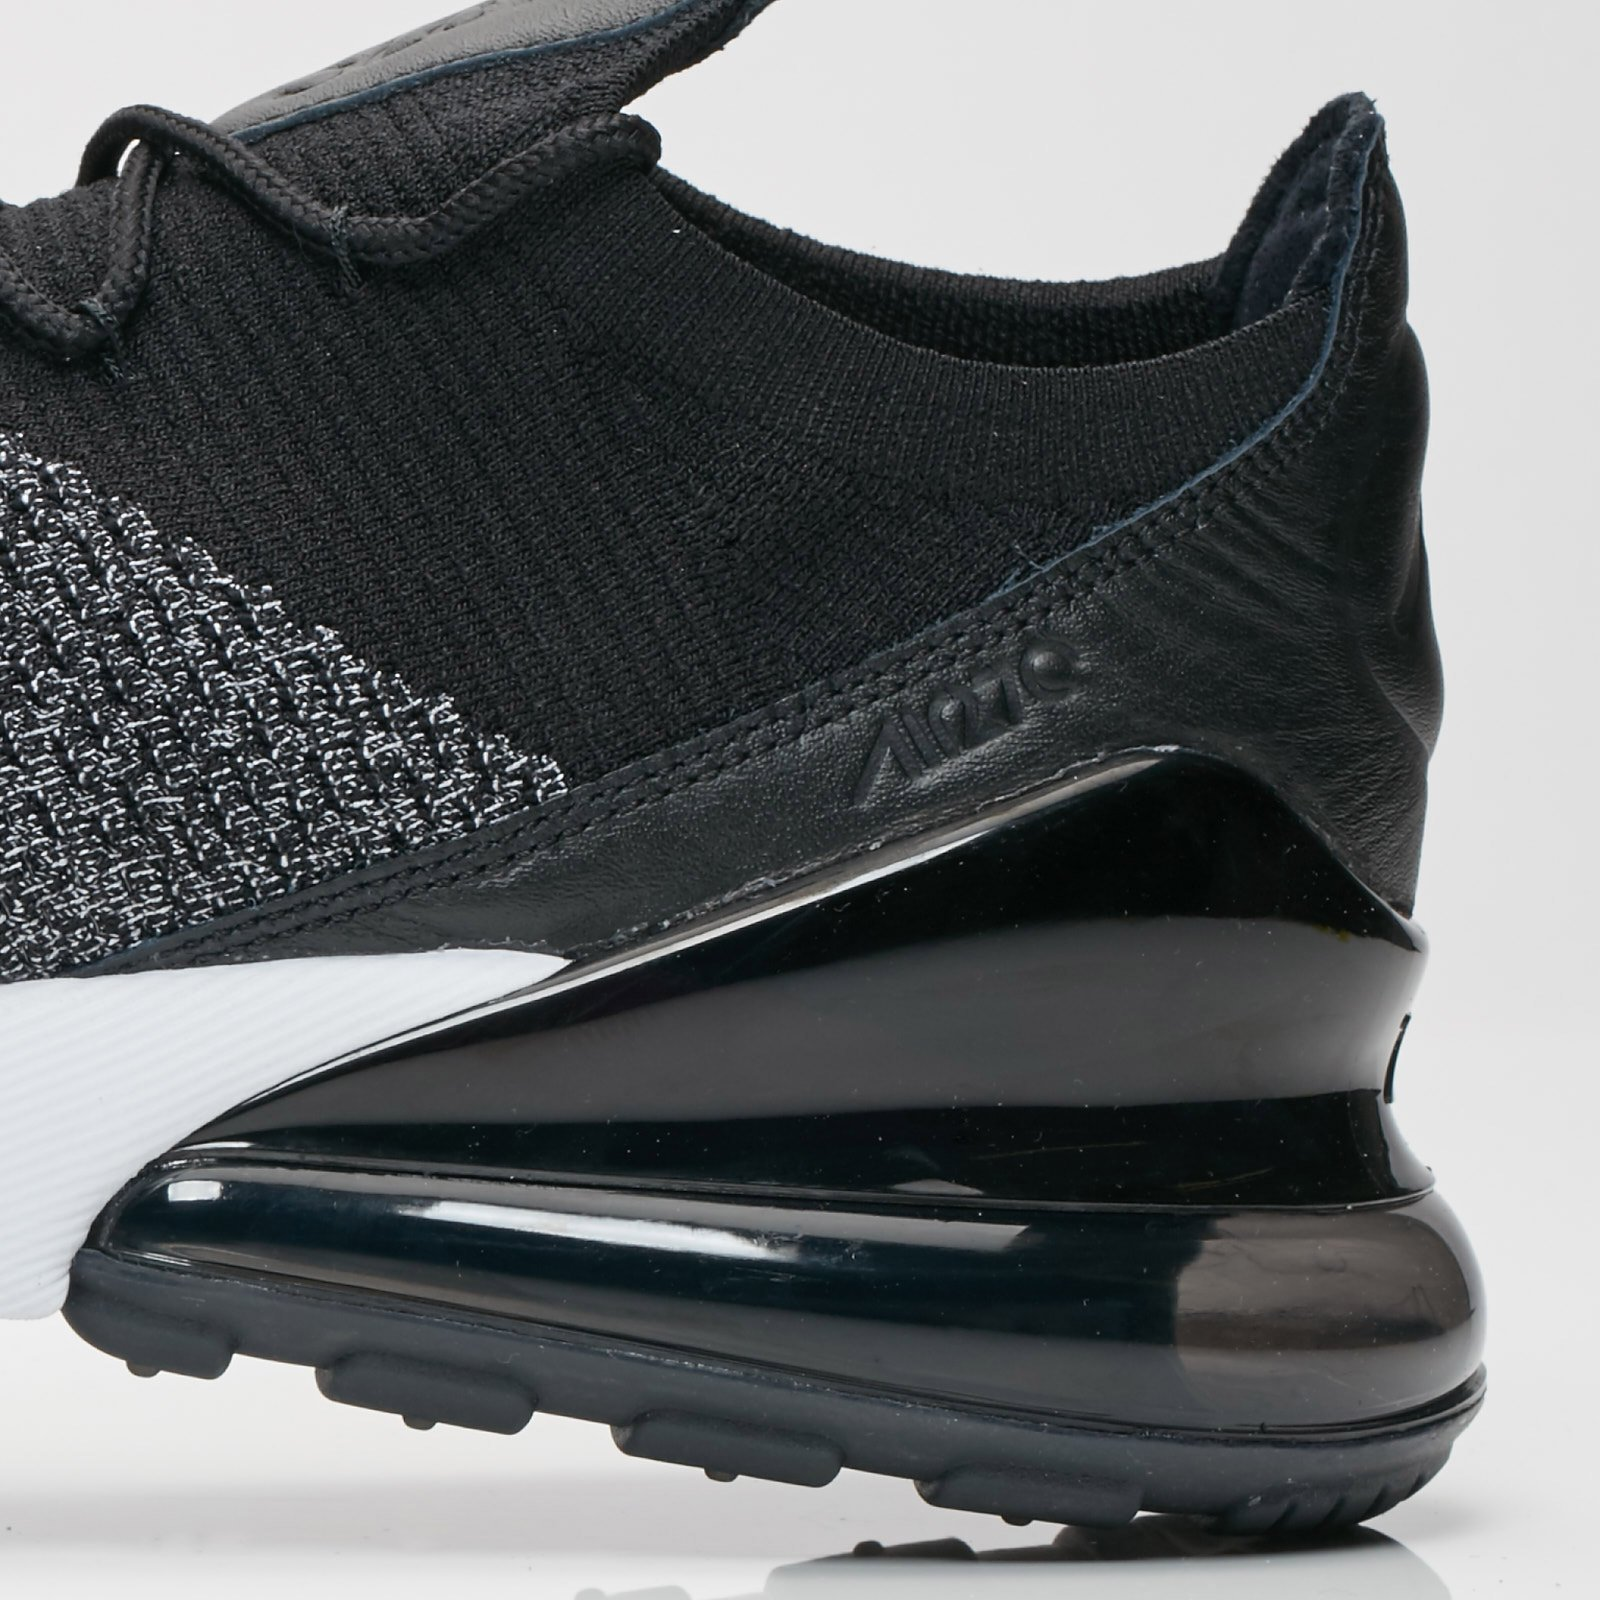 dca991b387b Nike Air Max 270 Flyknit - Ao1023-001 - Sneakersnstuff